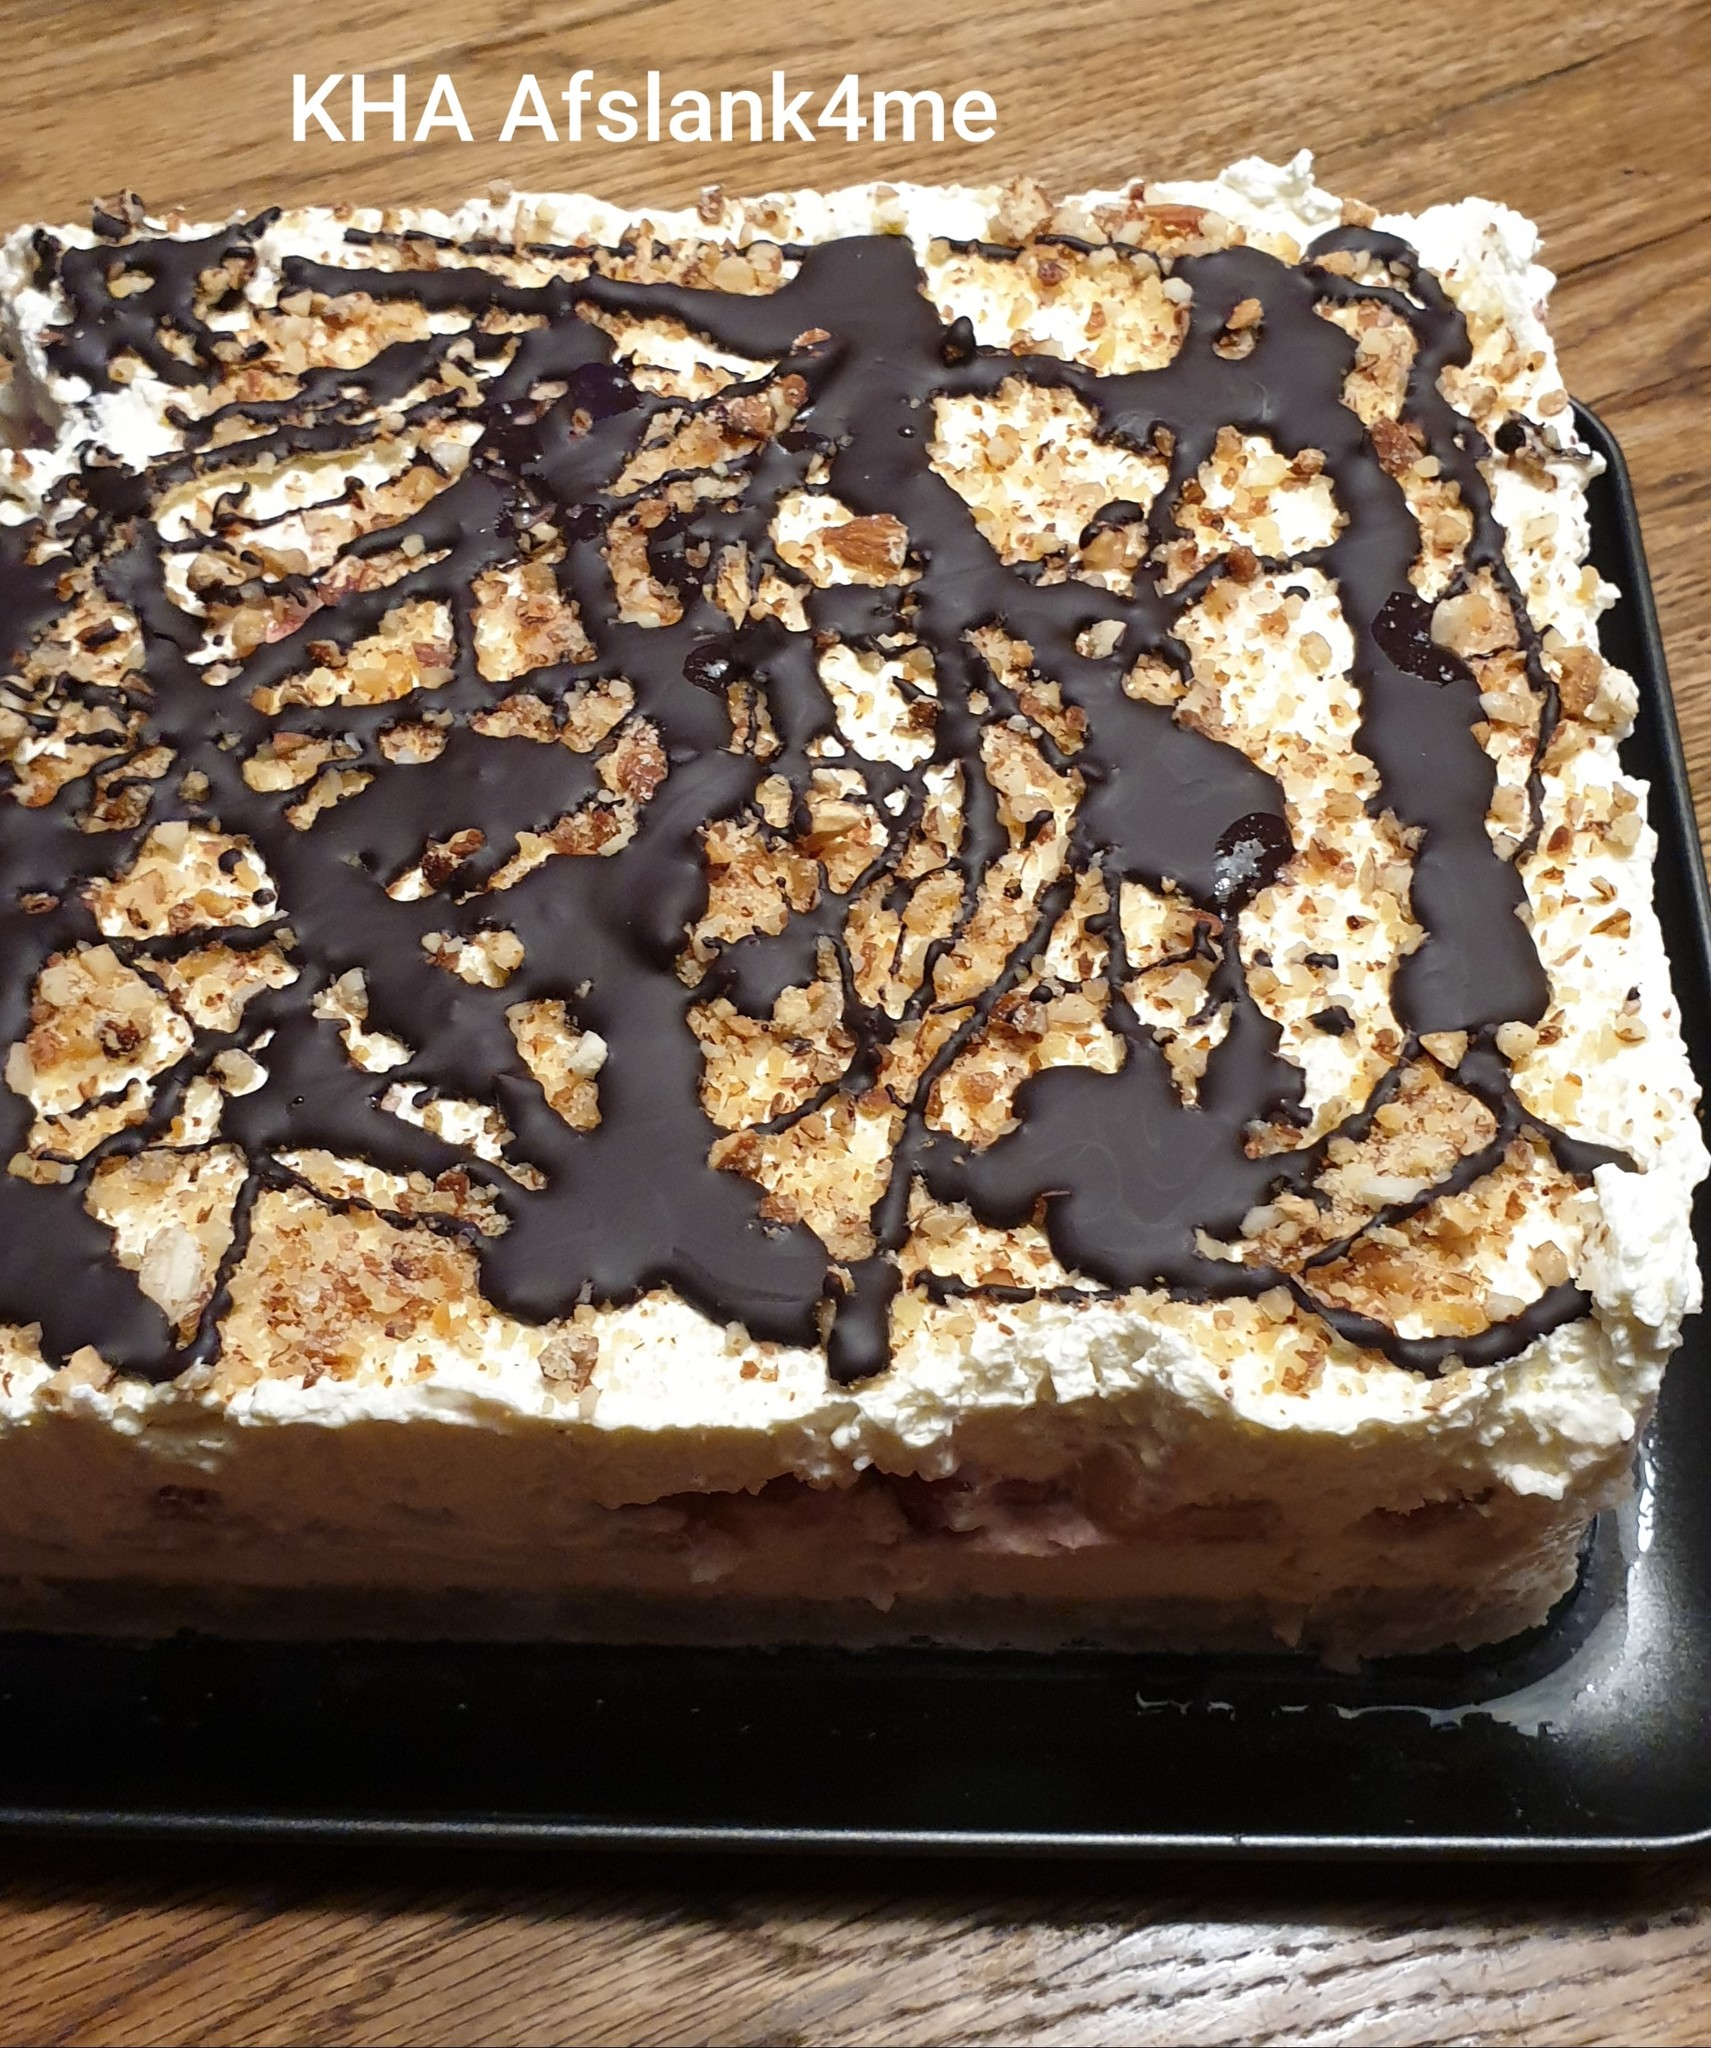 Bananen Split Cheesecake-Koolhydraatbeperkt maar kan ook KHA